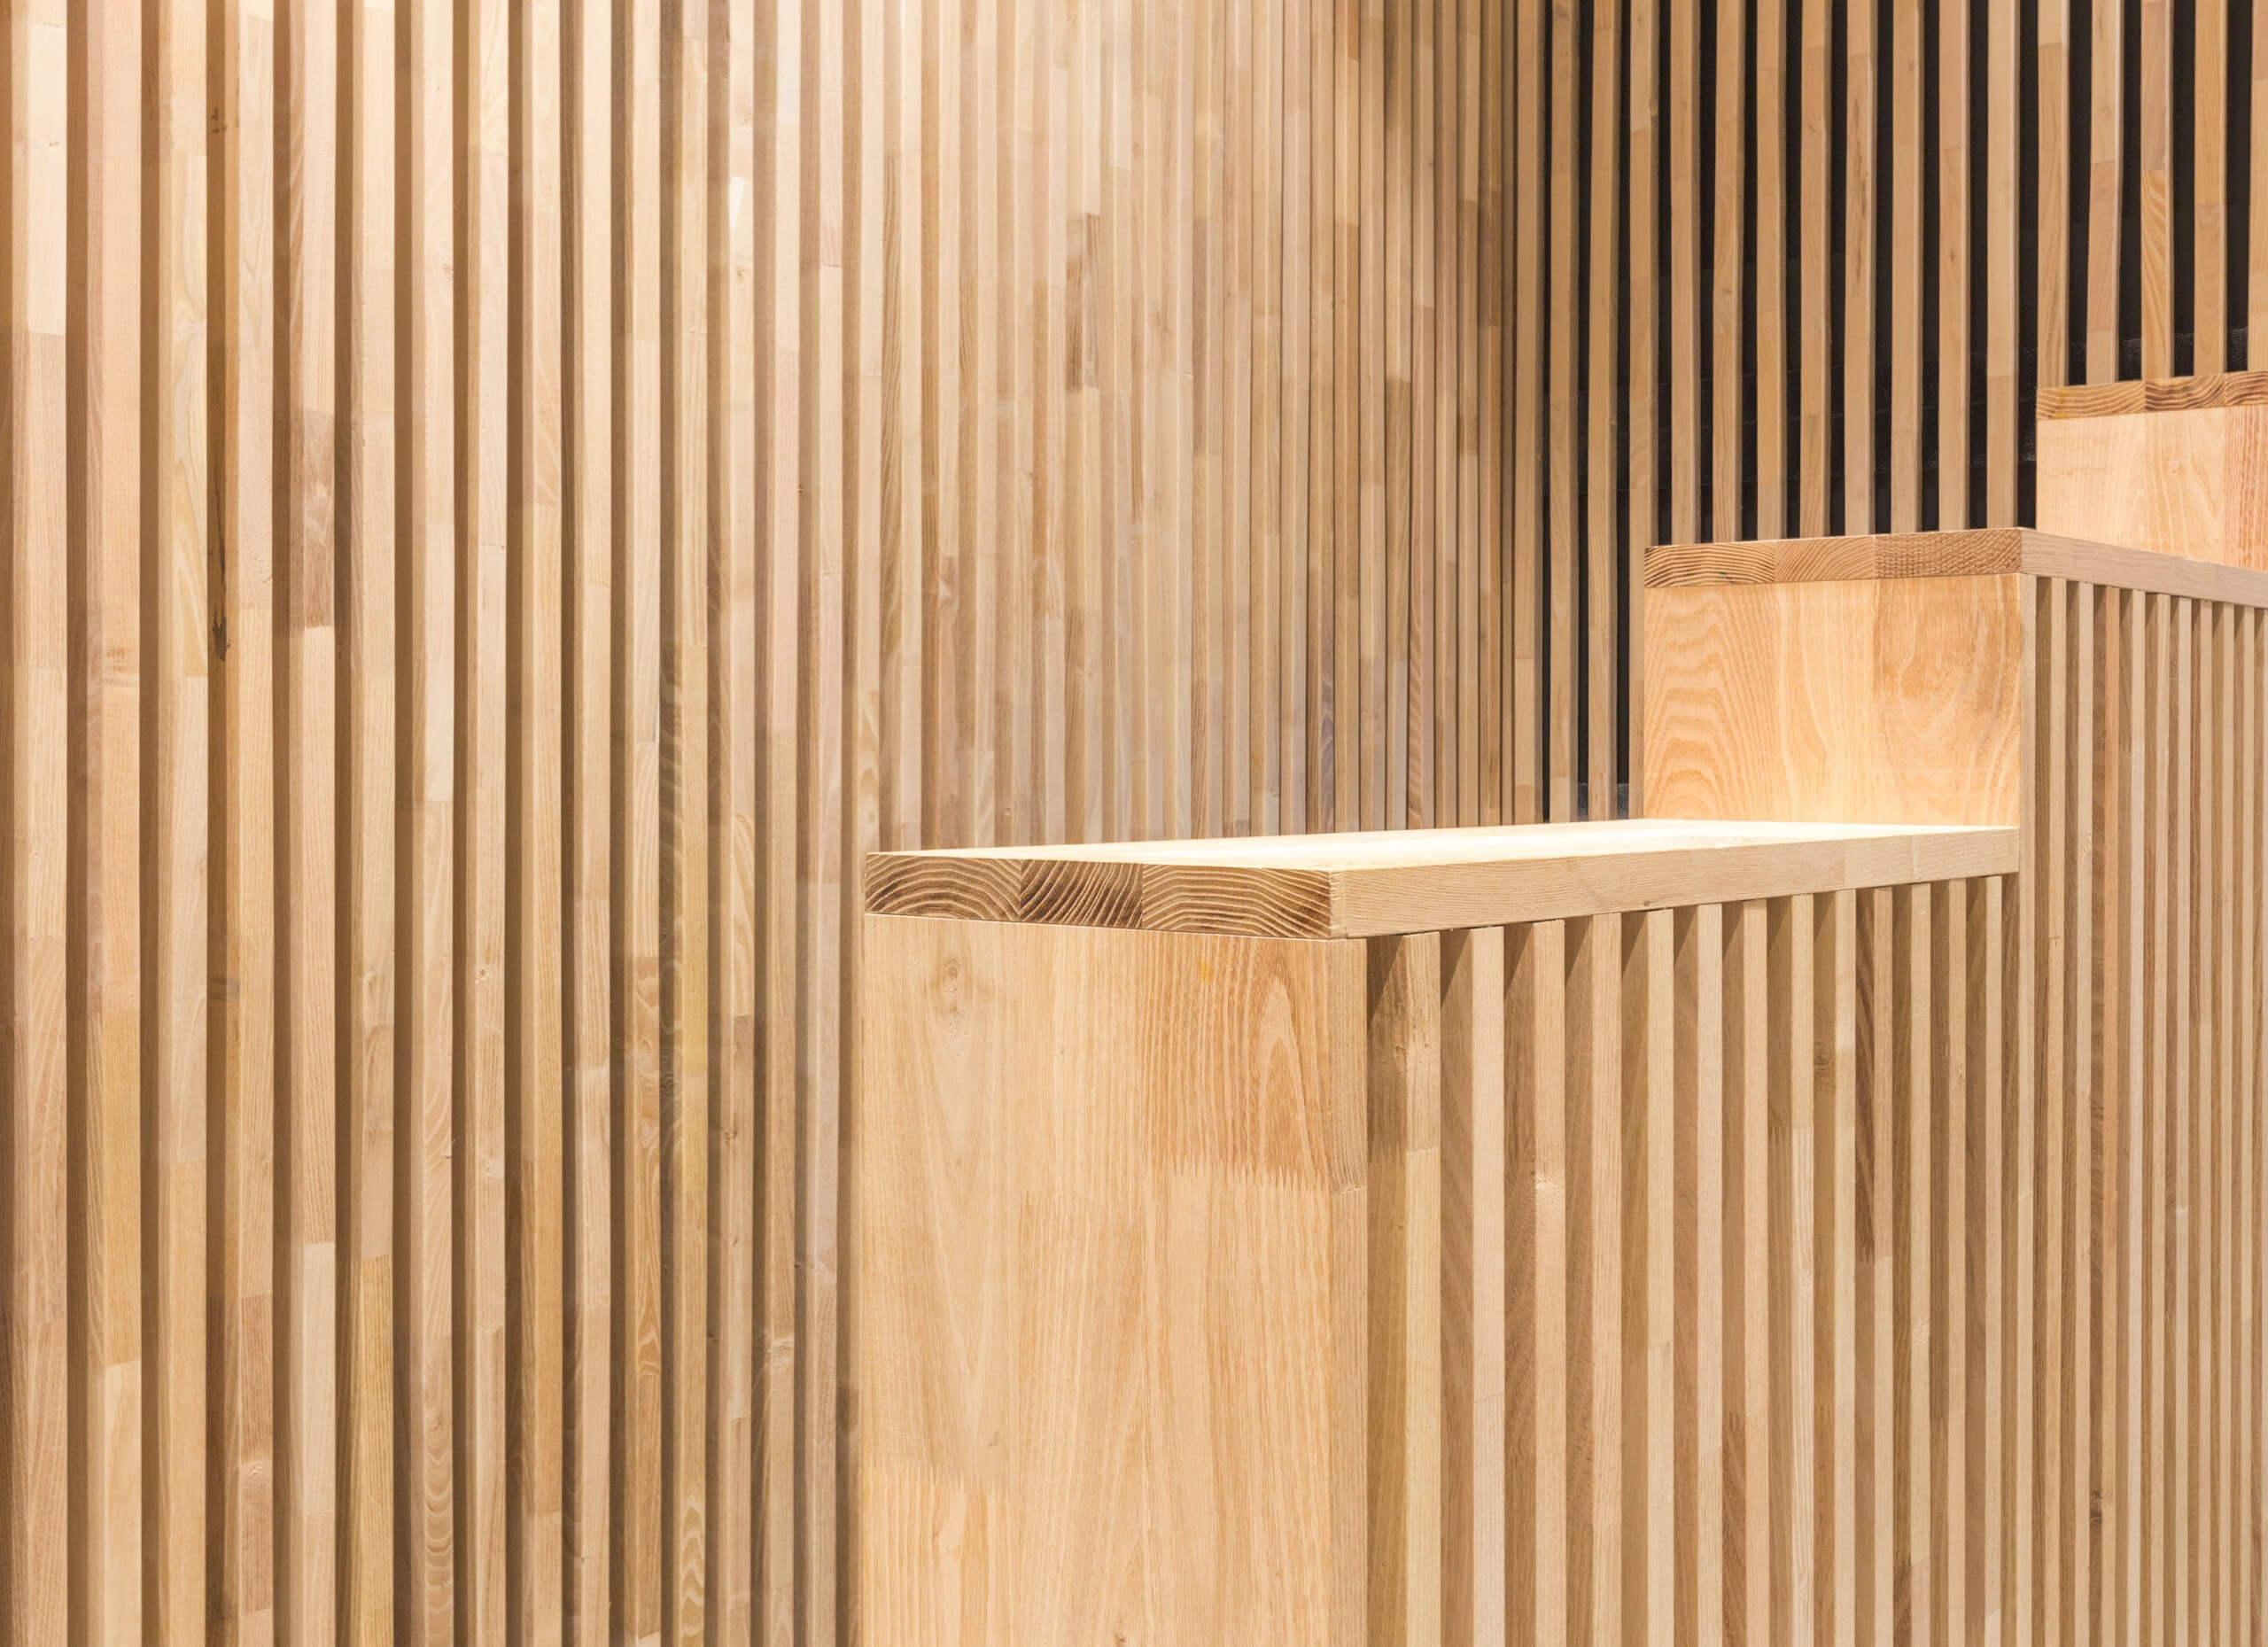 detail van maatwerk houten hek en wandbekleding